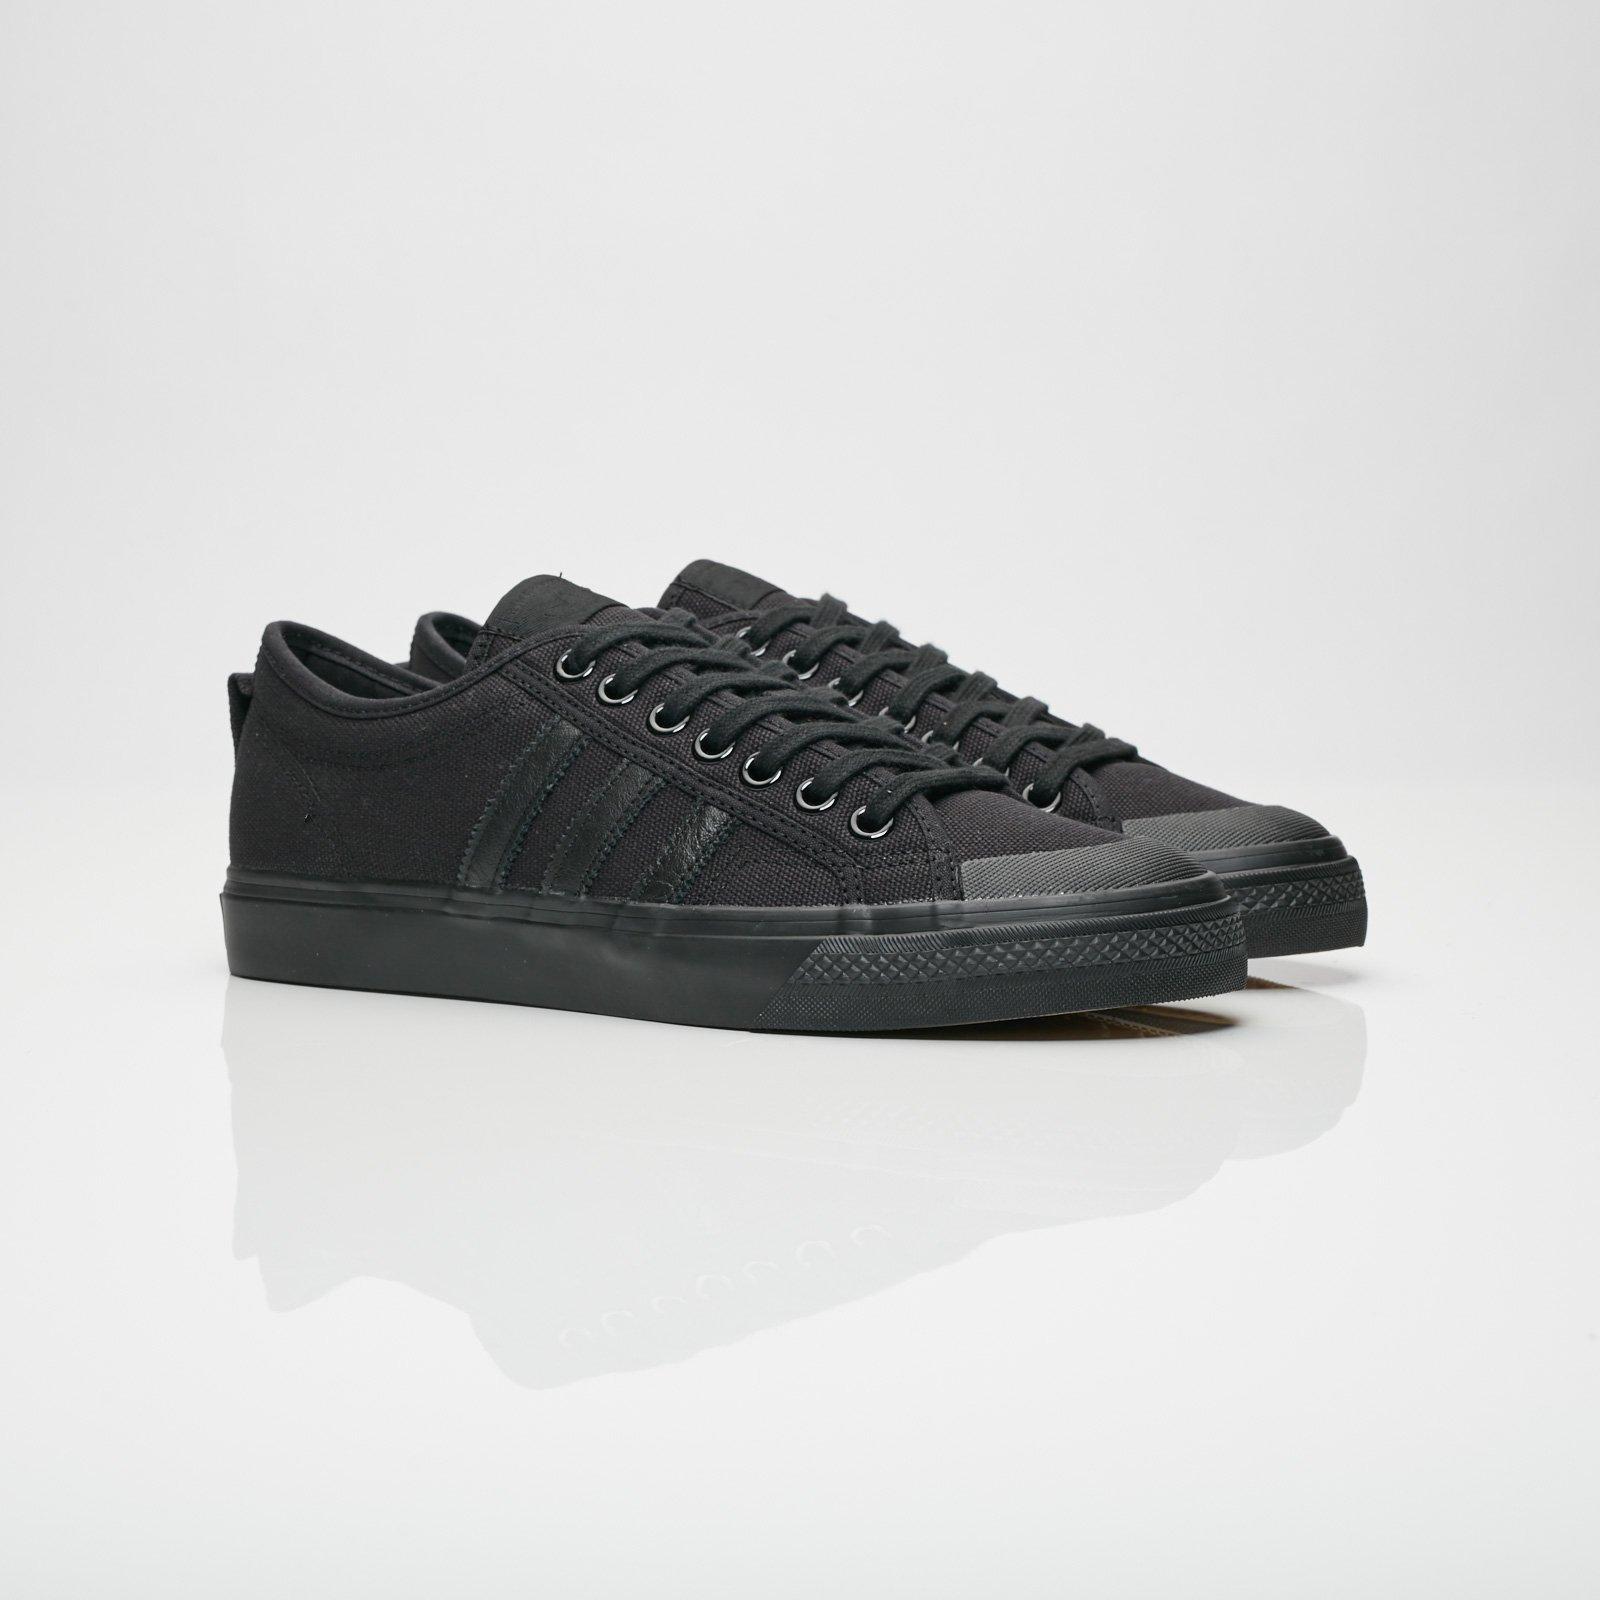 f246c176cd45 adidas Nizza Low - Bz0495 - Sneakersnstuff